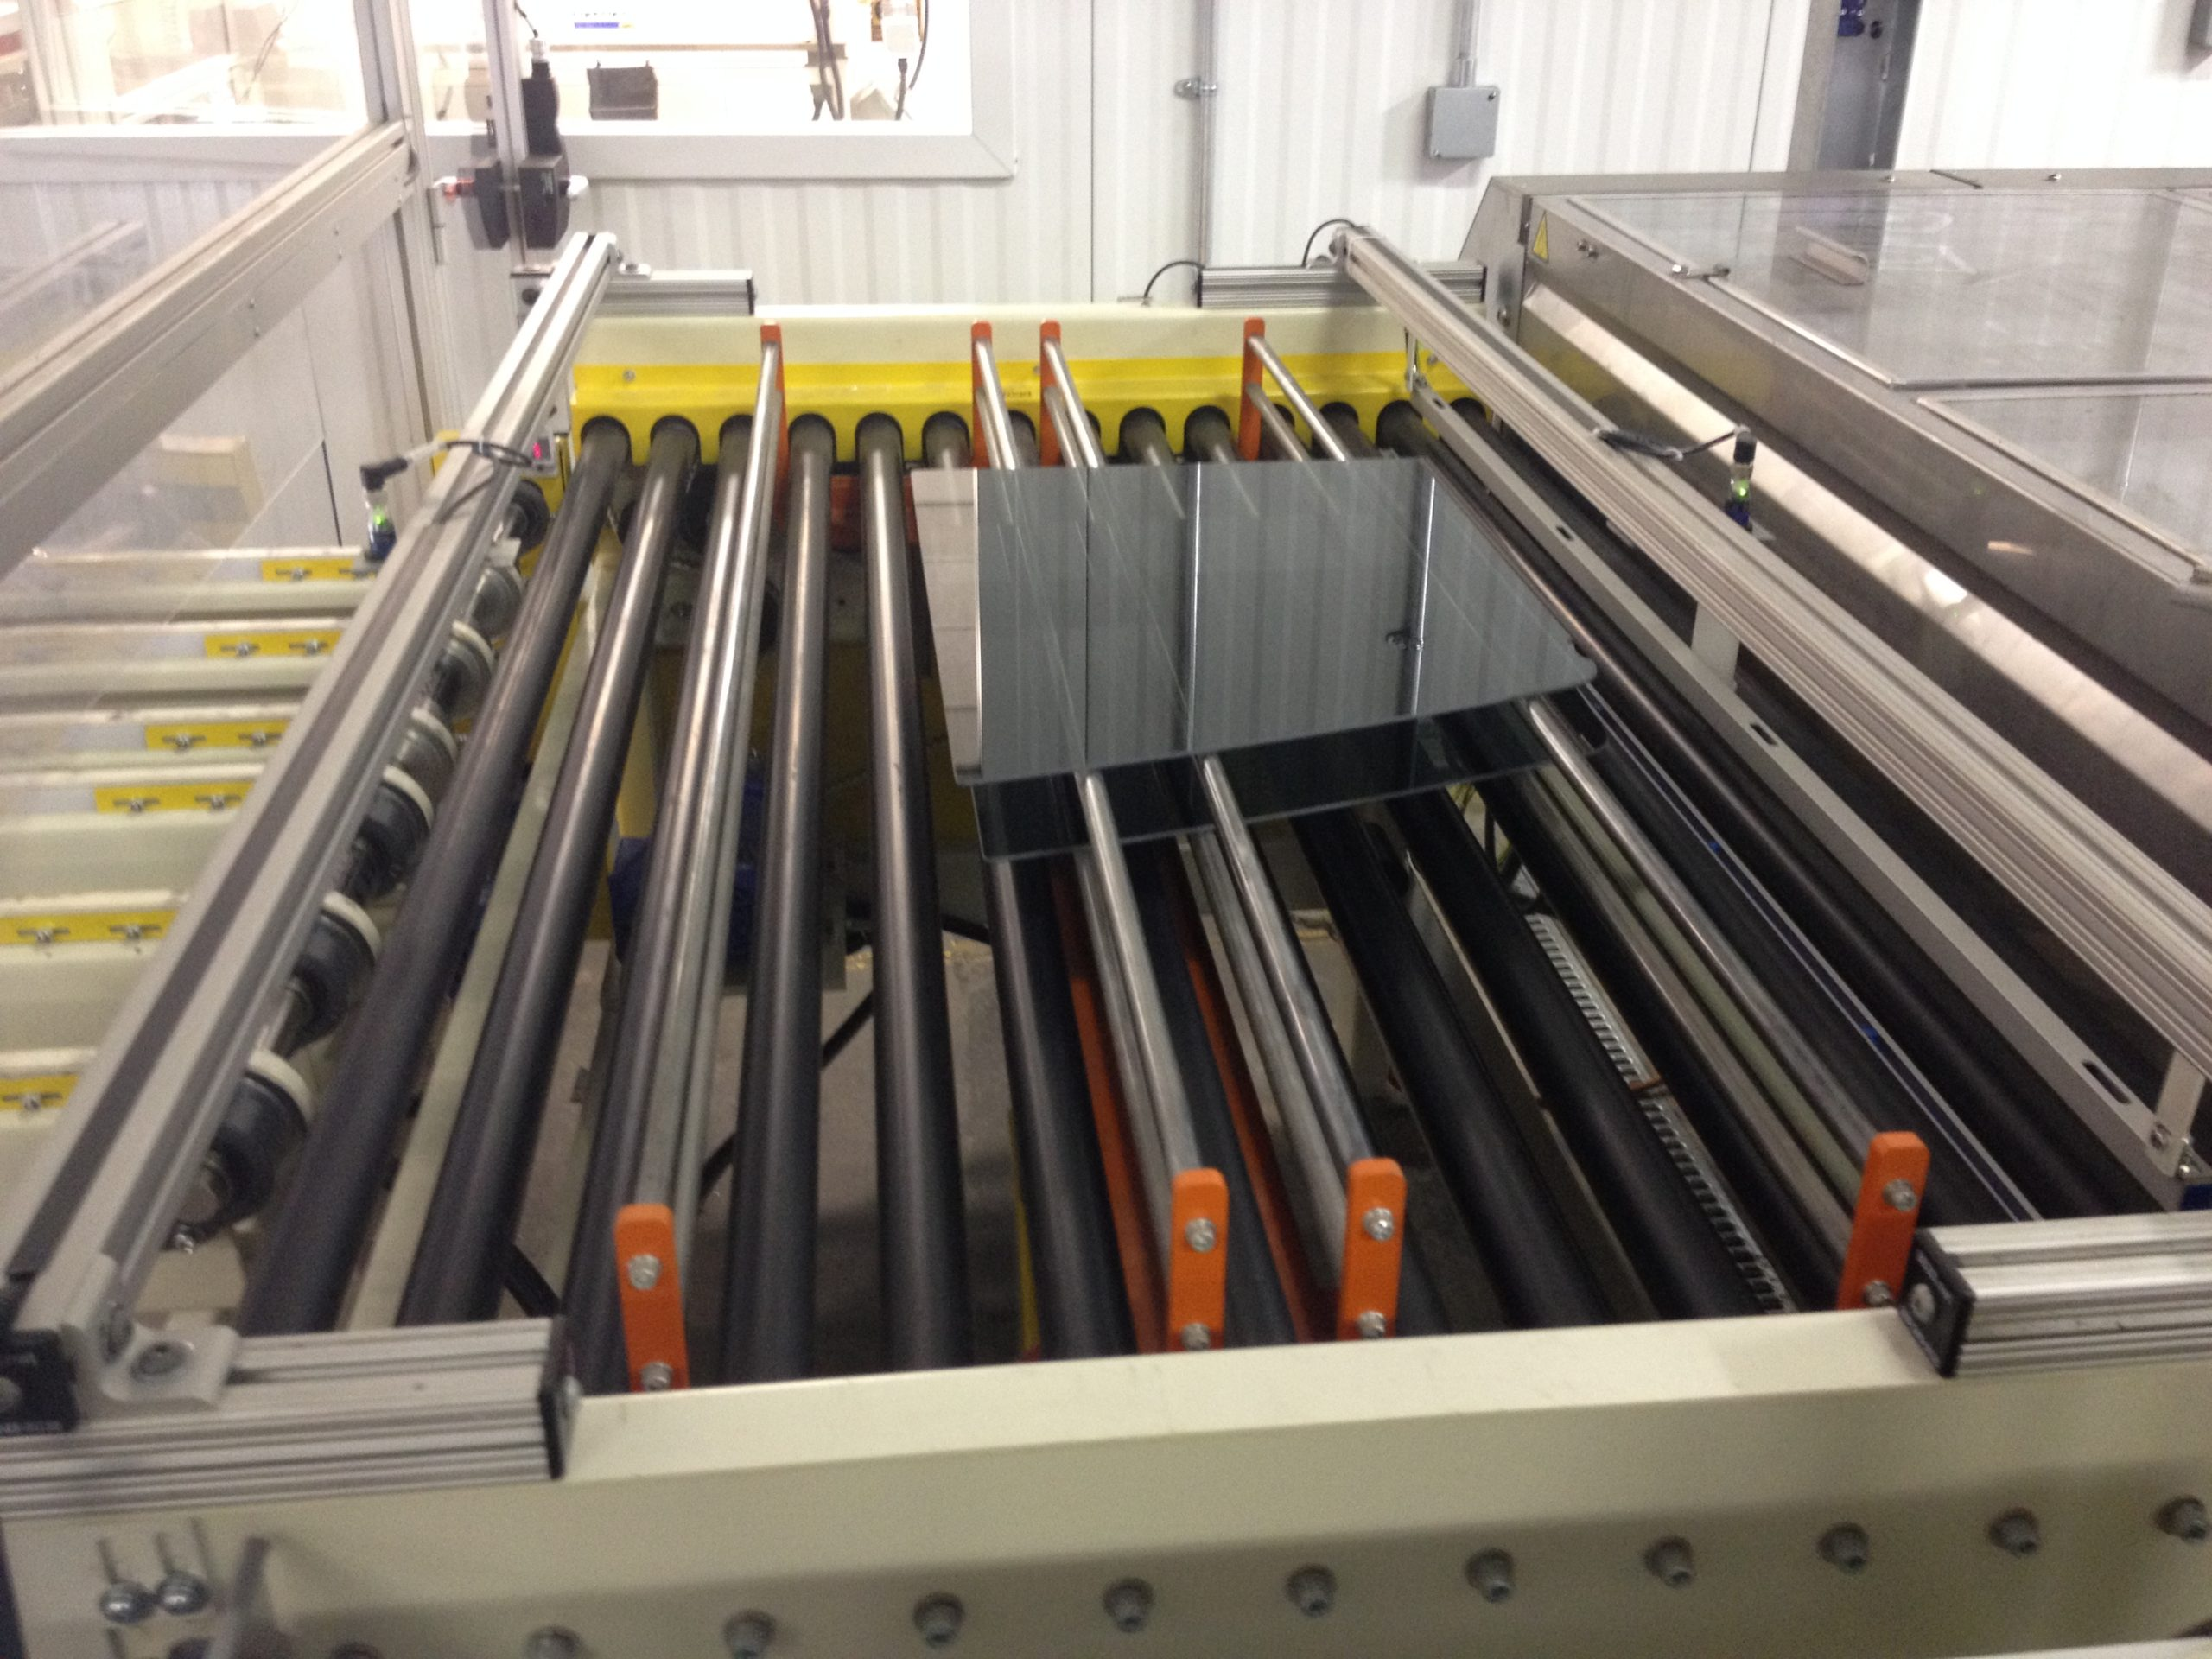 Vertical Accumulators - 3-level accumulator | Glassline